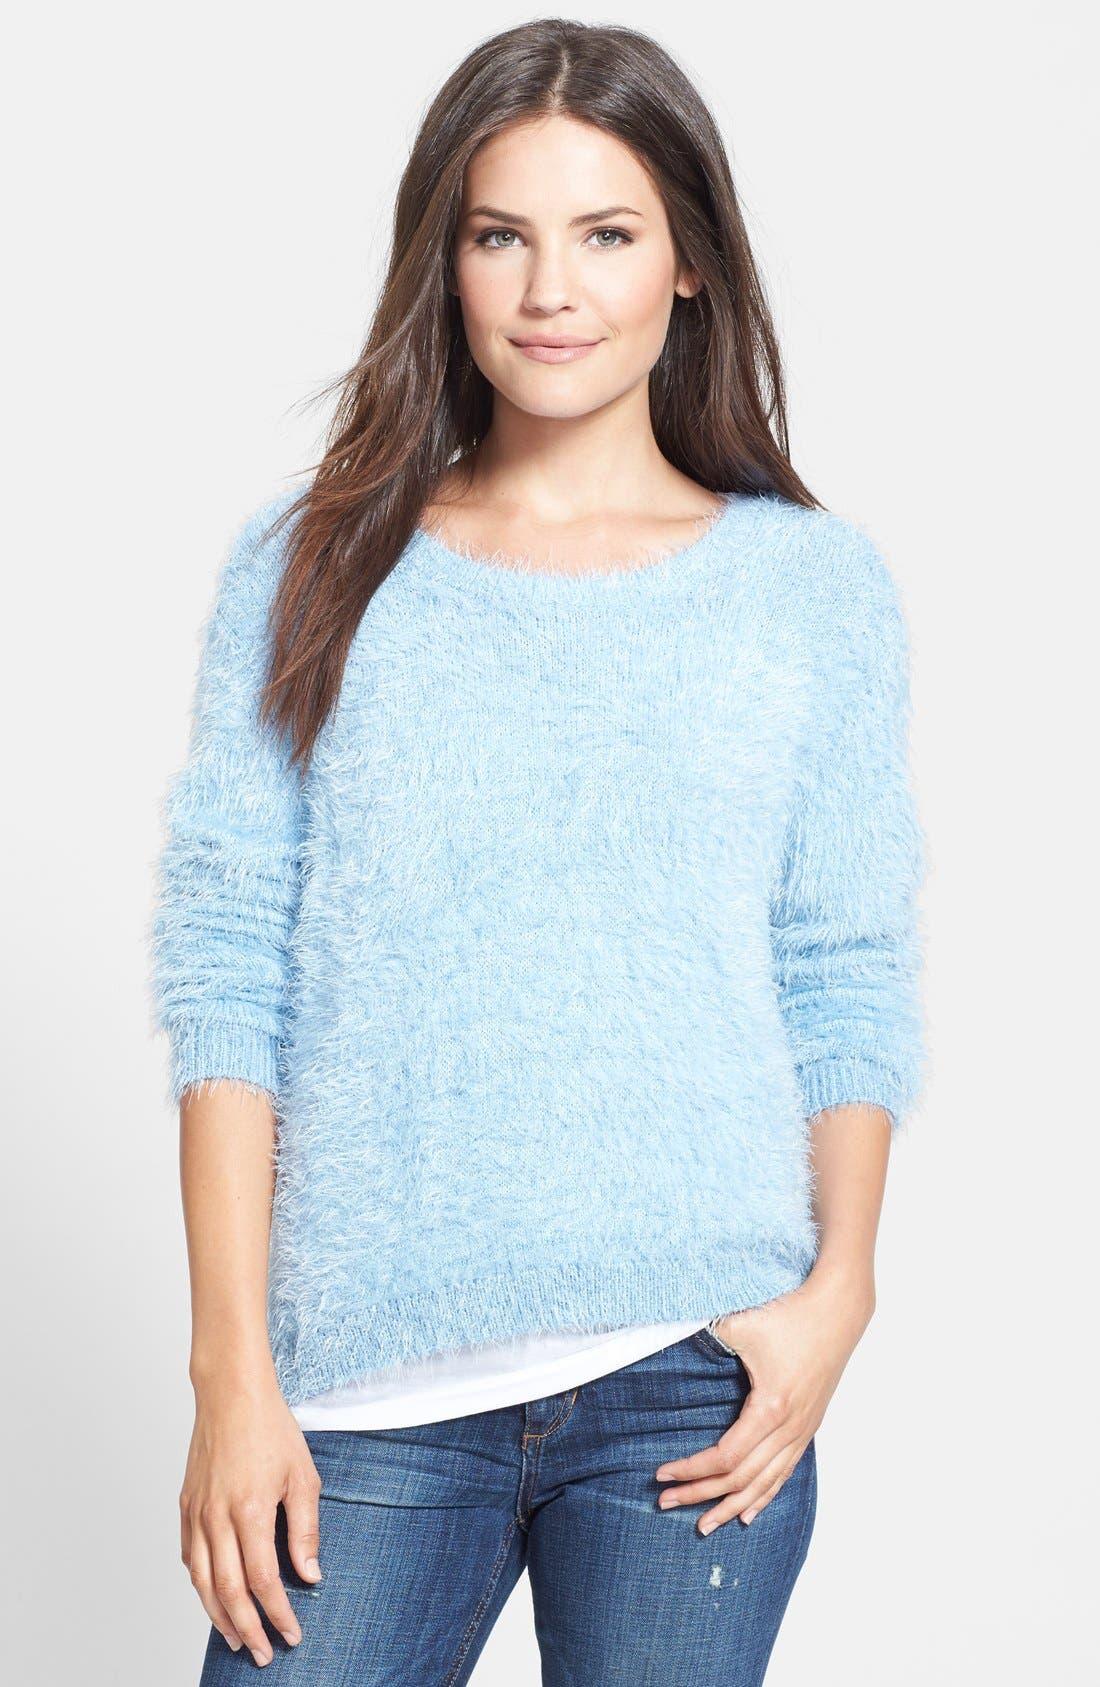 Alternate Image 1 Selected - Vince Camuto Eyelash Knit Sweater (Petite)